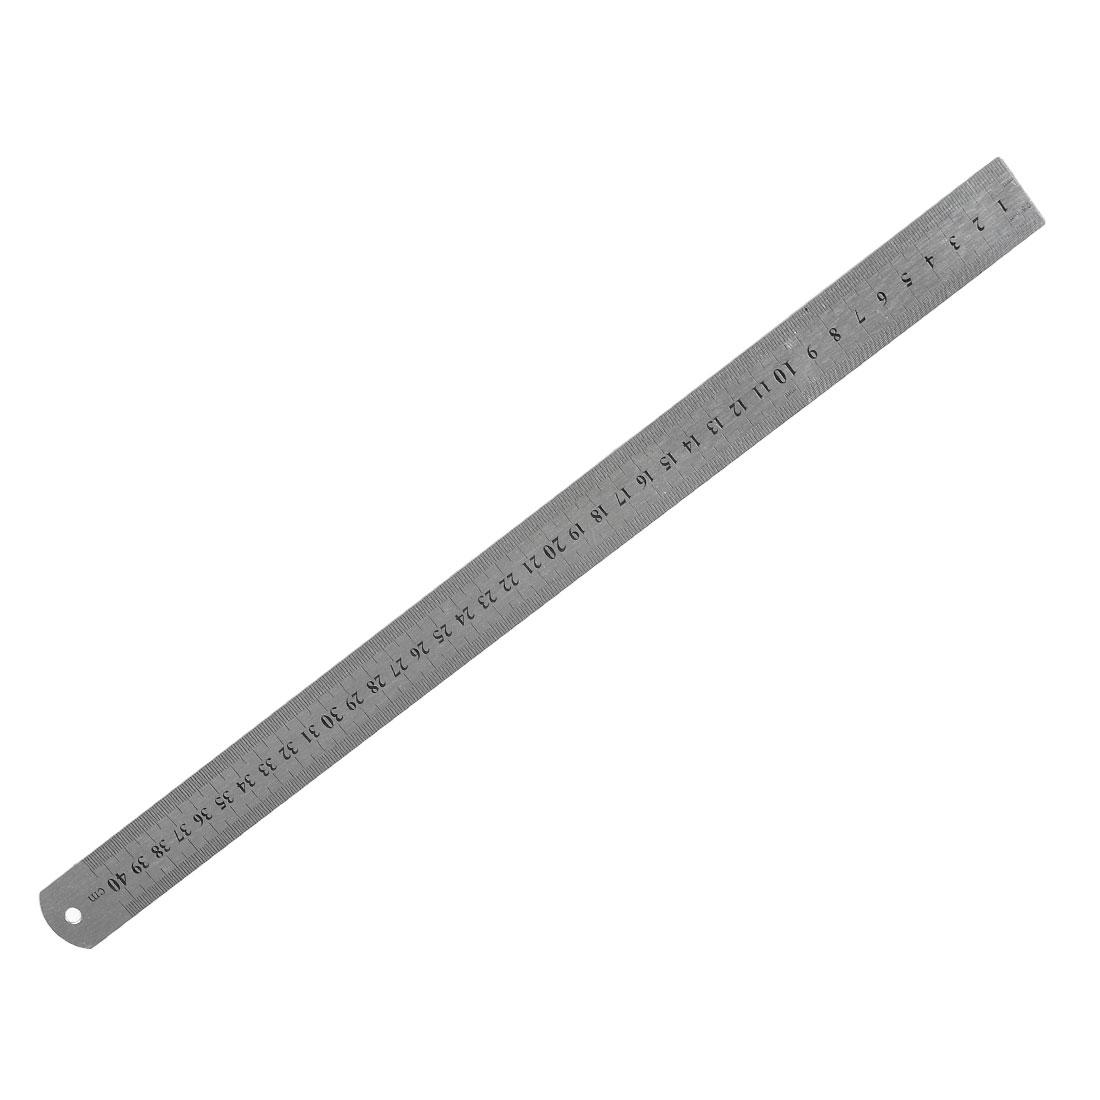 Stainless Steel 16 Inch Straight Ruler Measuring Kit Metric 40cm